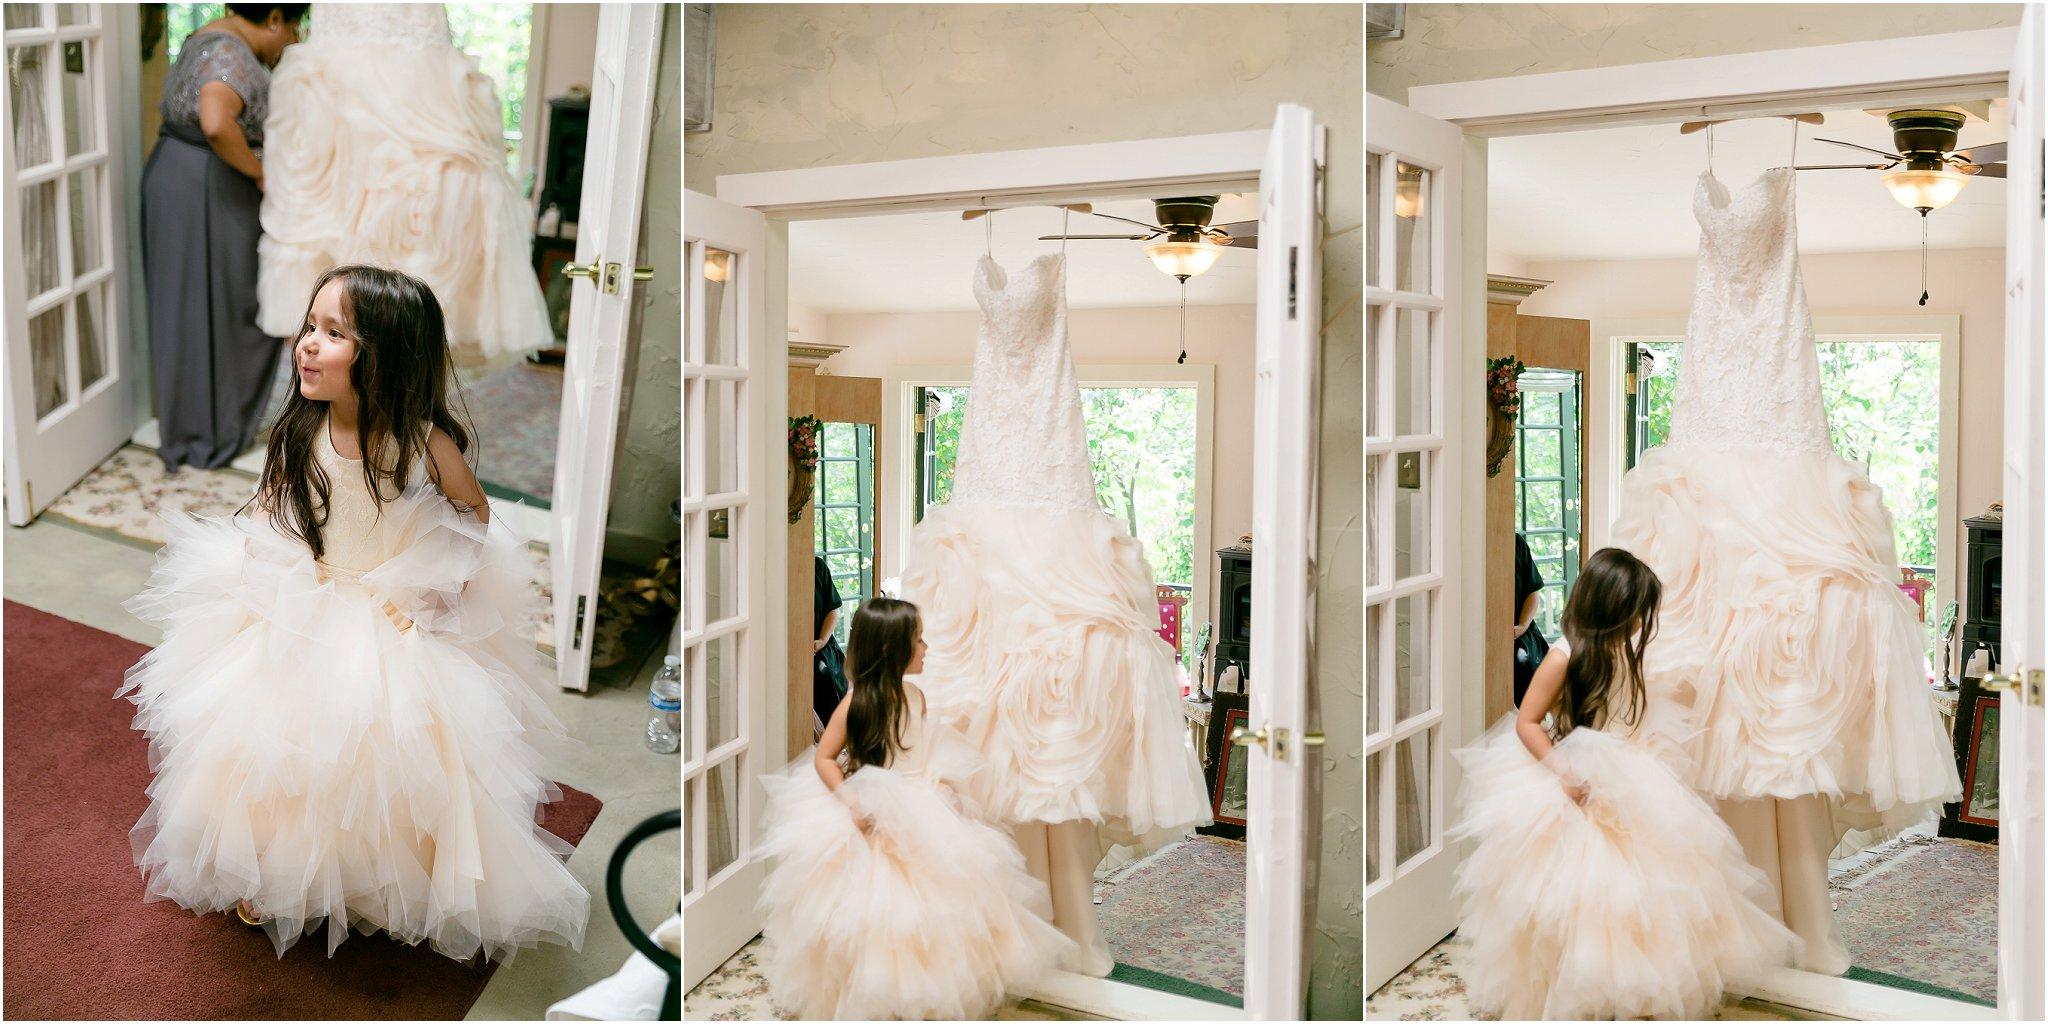 Finest Rubidia C Photography Oakland Bay Area Walnut Creek Bay Area Oakland  Sf Wedding Ca With Wedding Dress Bay Area.